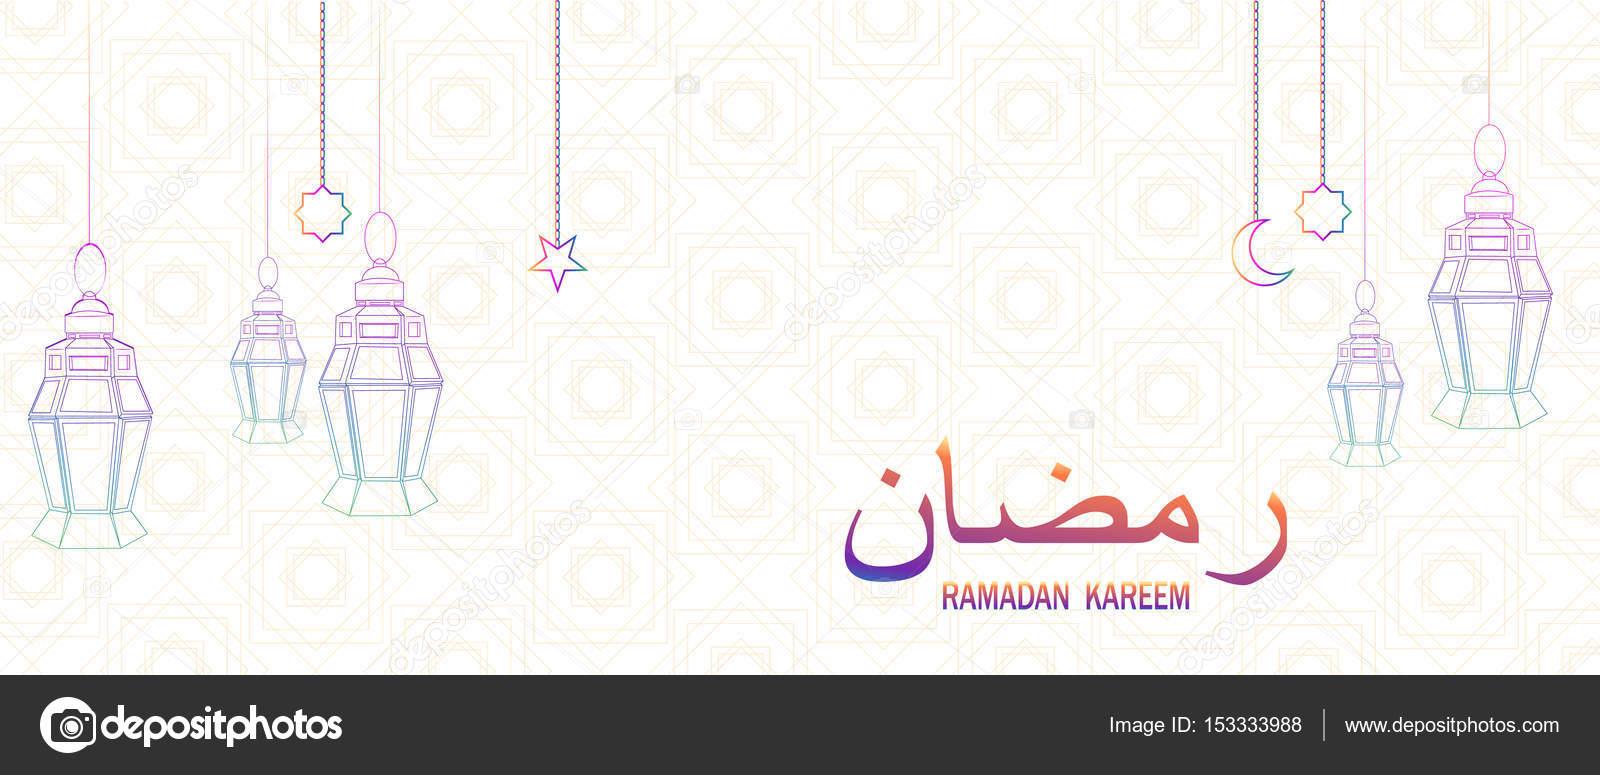 Ramadan beautiful greeting card with hanging lanterns moon and ramadan beautiful greeting card with hanging lanterns moon and stars on abstract background lettering translates as ramadan kareem muslim traditional m4hsunfo